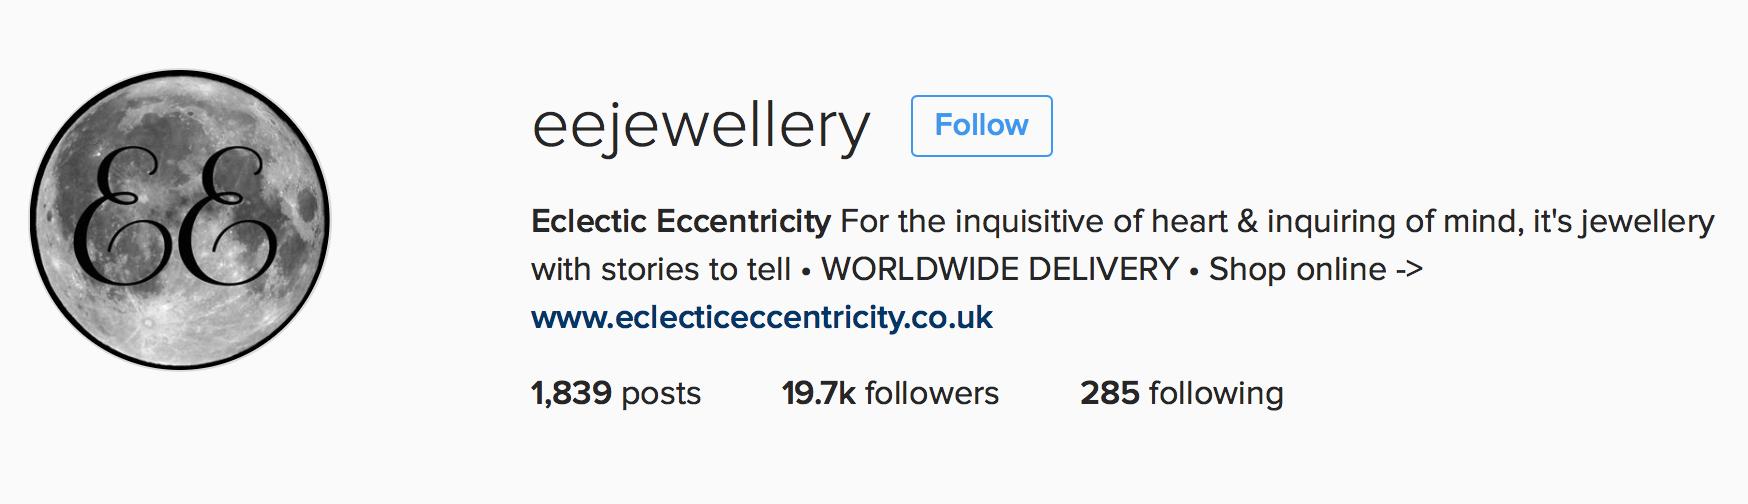 Eclectic Eccentricity Instagram profile